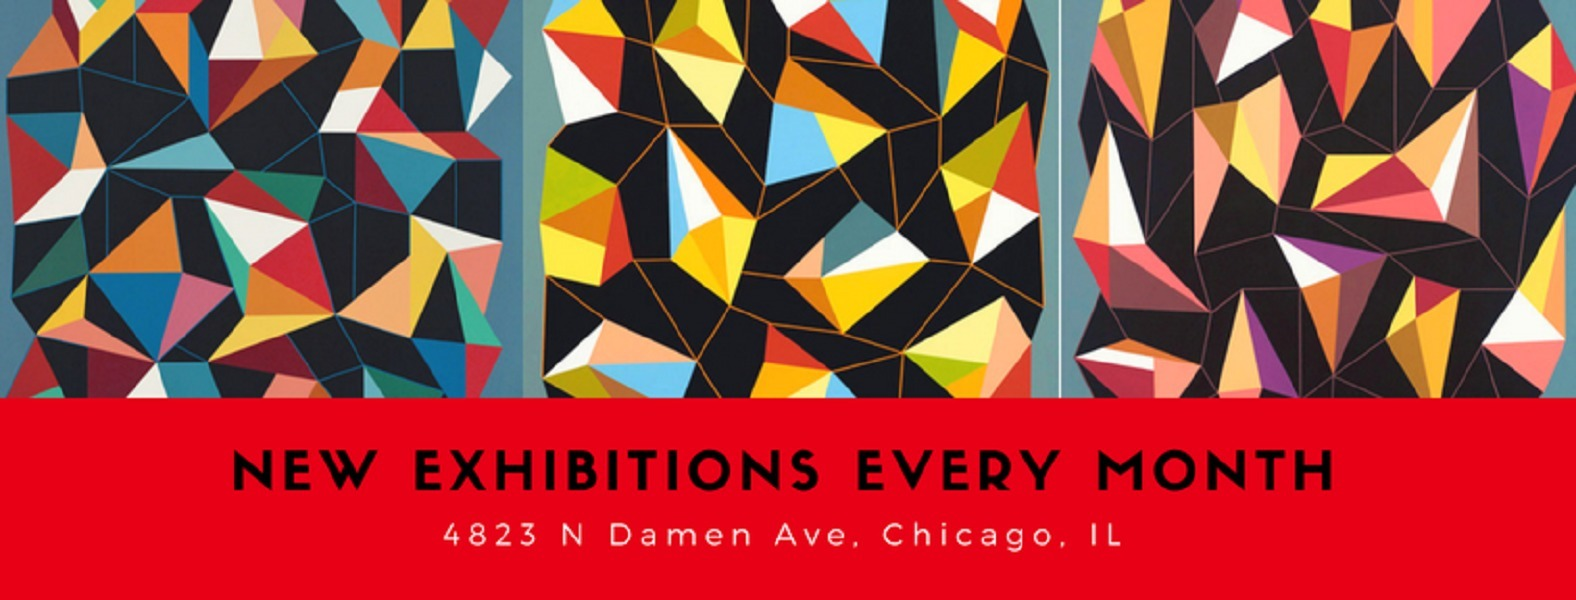 Hofheimer Gallery (@hofheimergallery) Cover Image